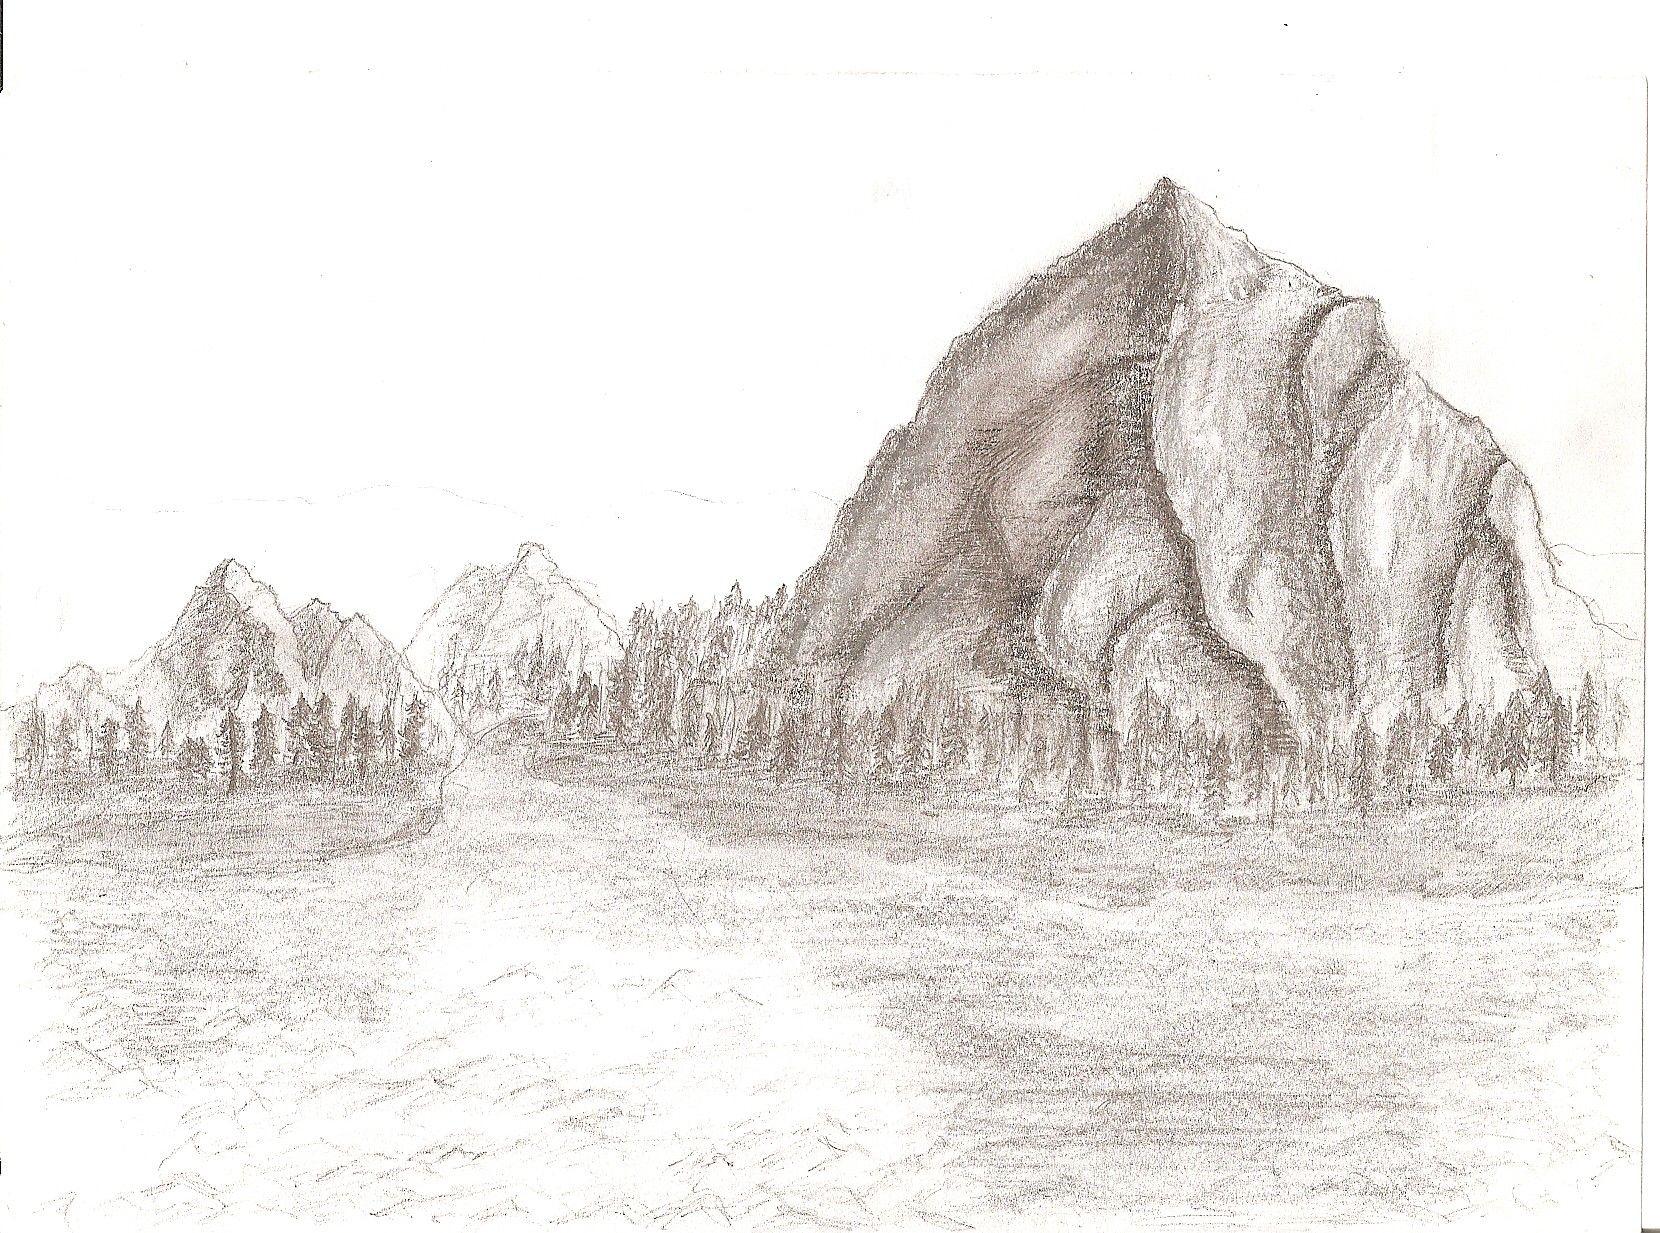 Mountains by Ingrem48 on DeviantArt